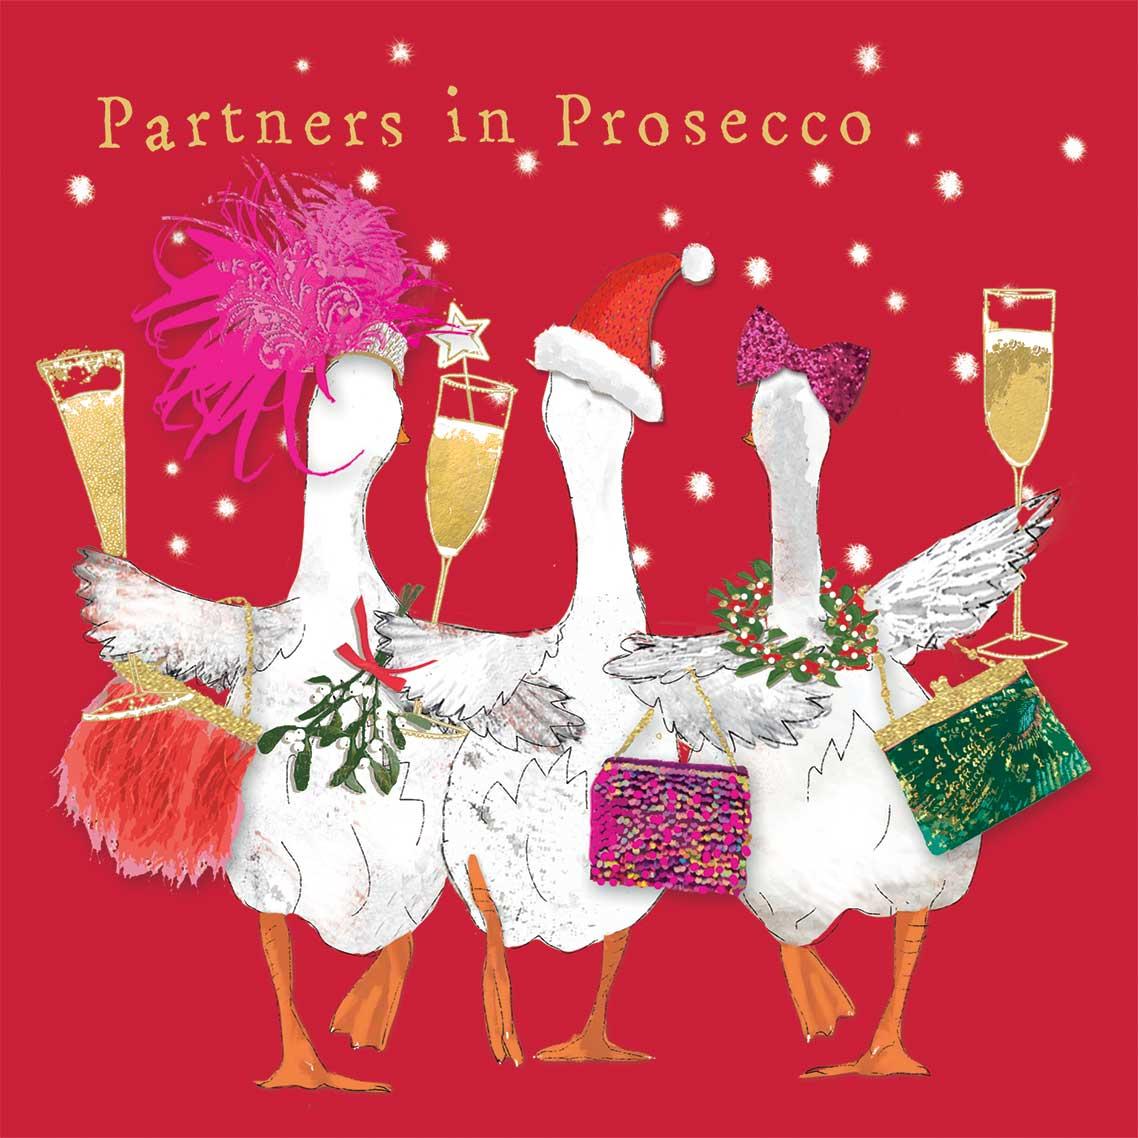 Partners in Prosecco Napkin 33x33